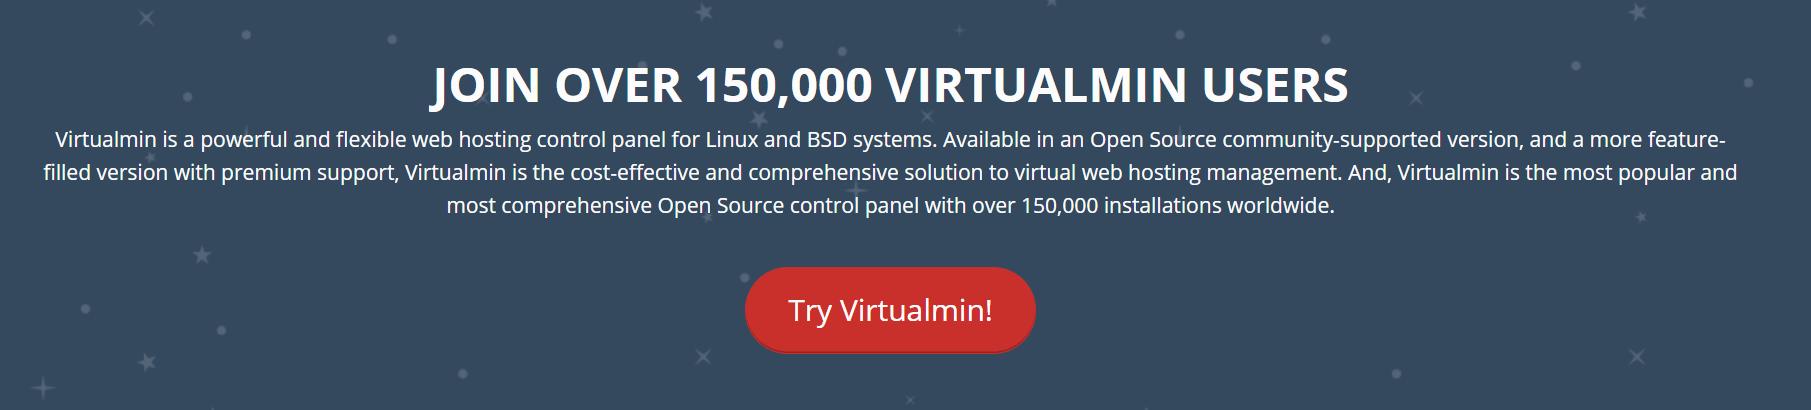 The Virtualmin homepage